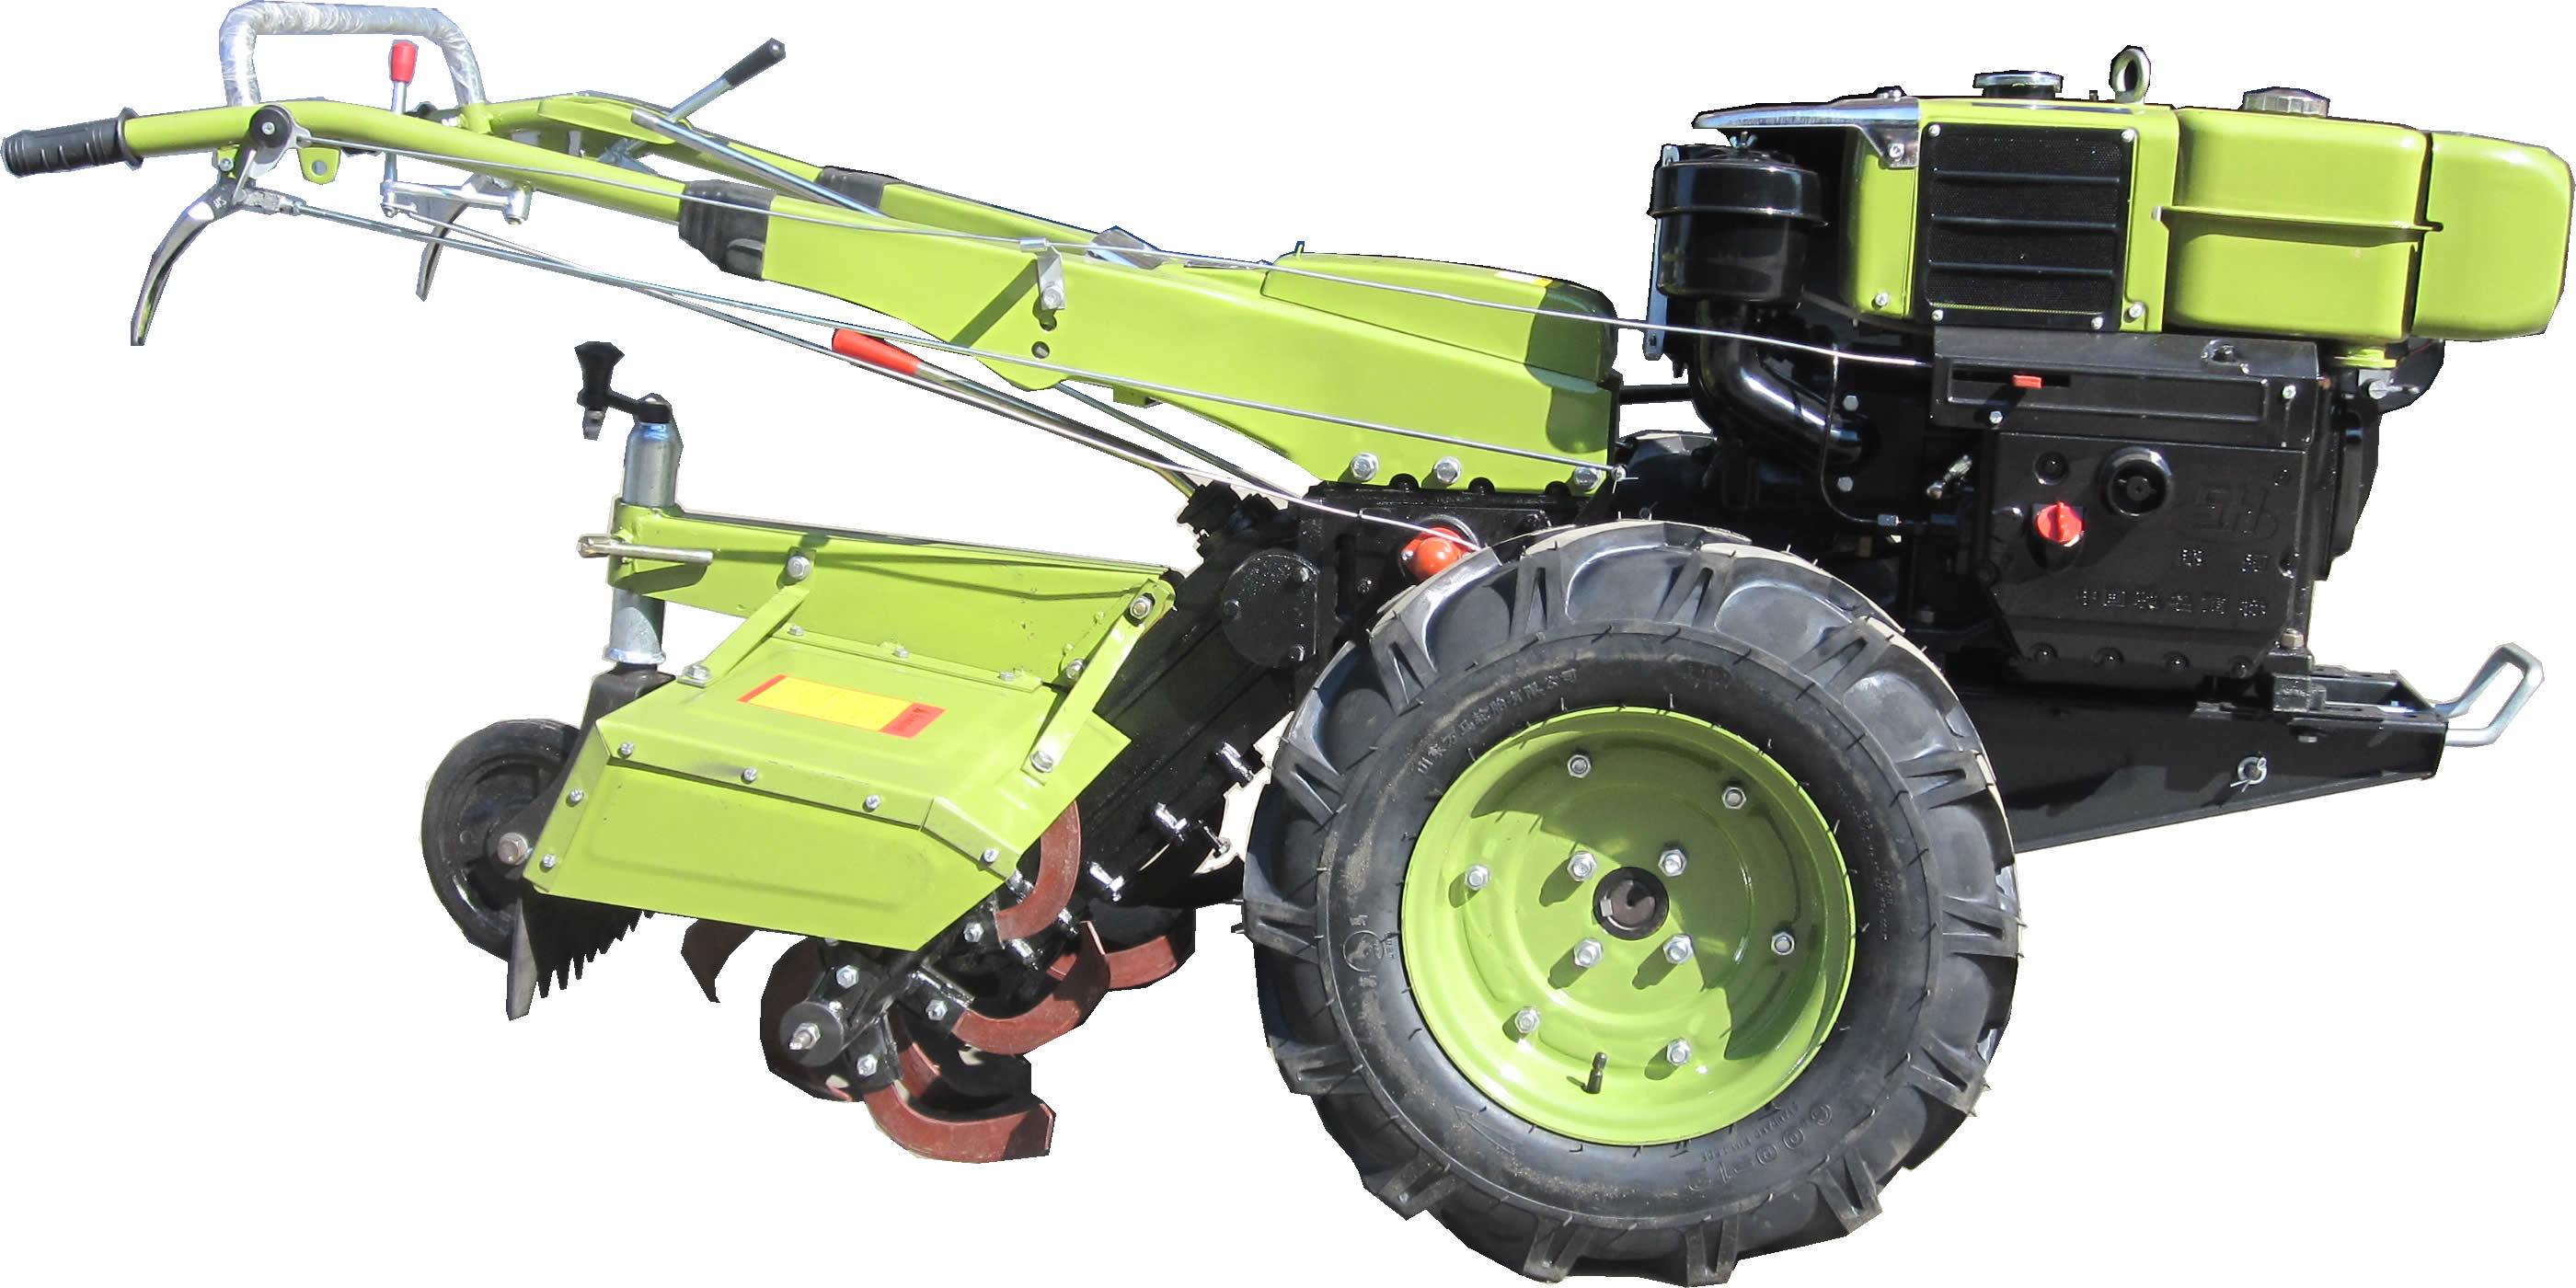 Tiller Tractor Walking Tractor Power Tiller